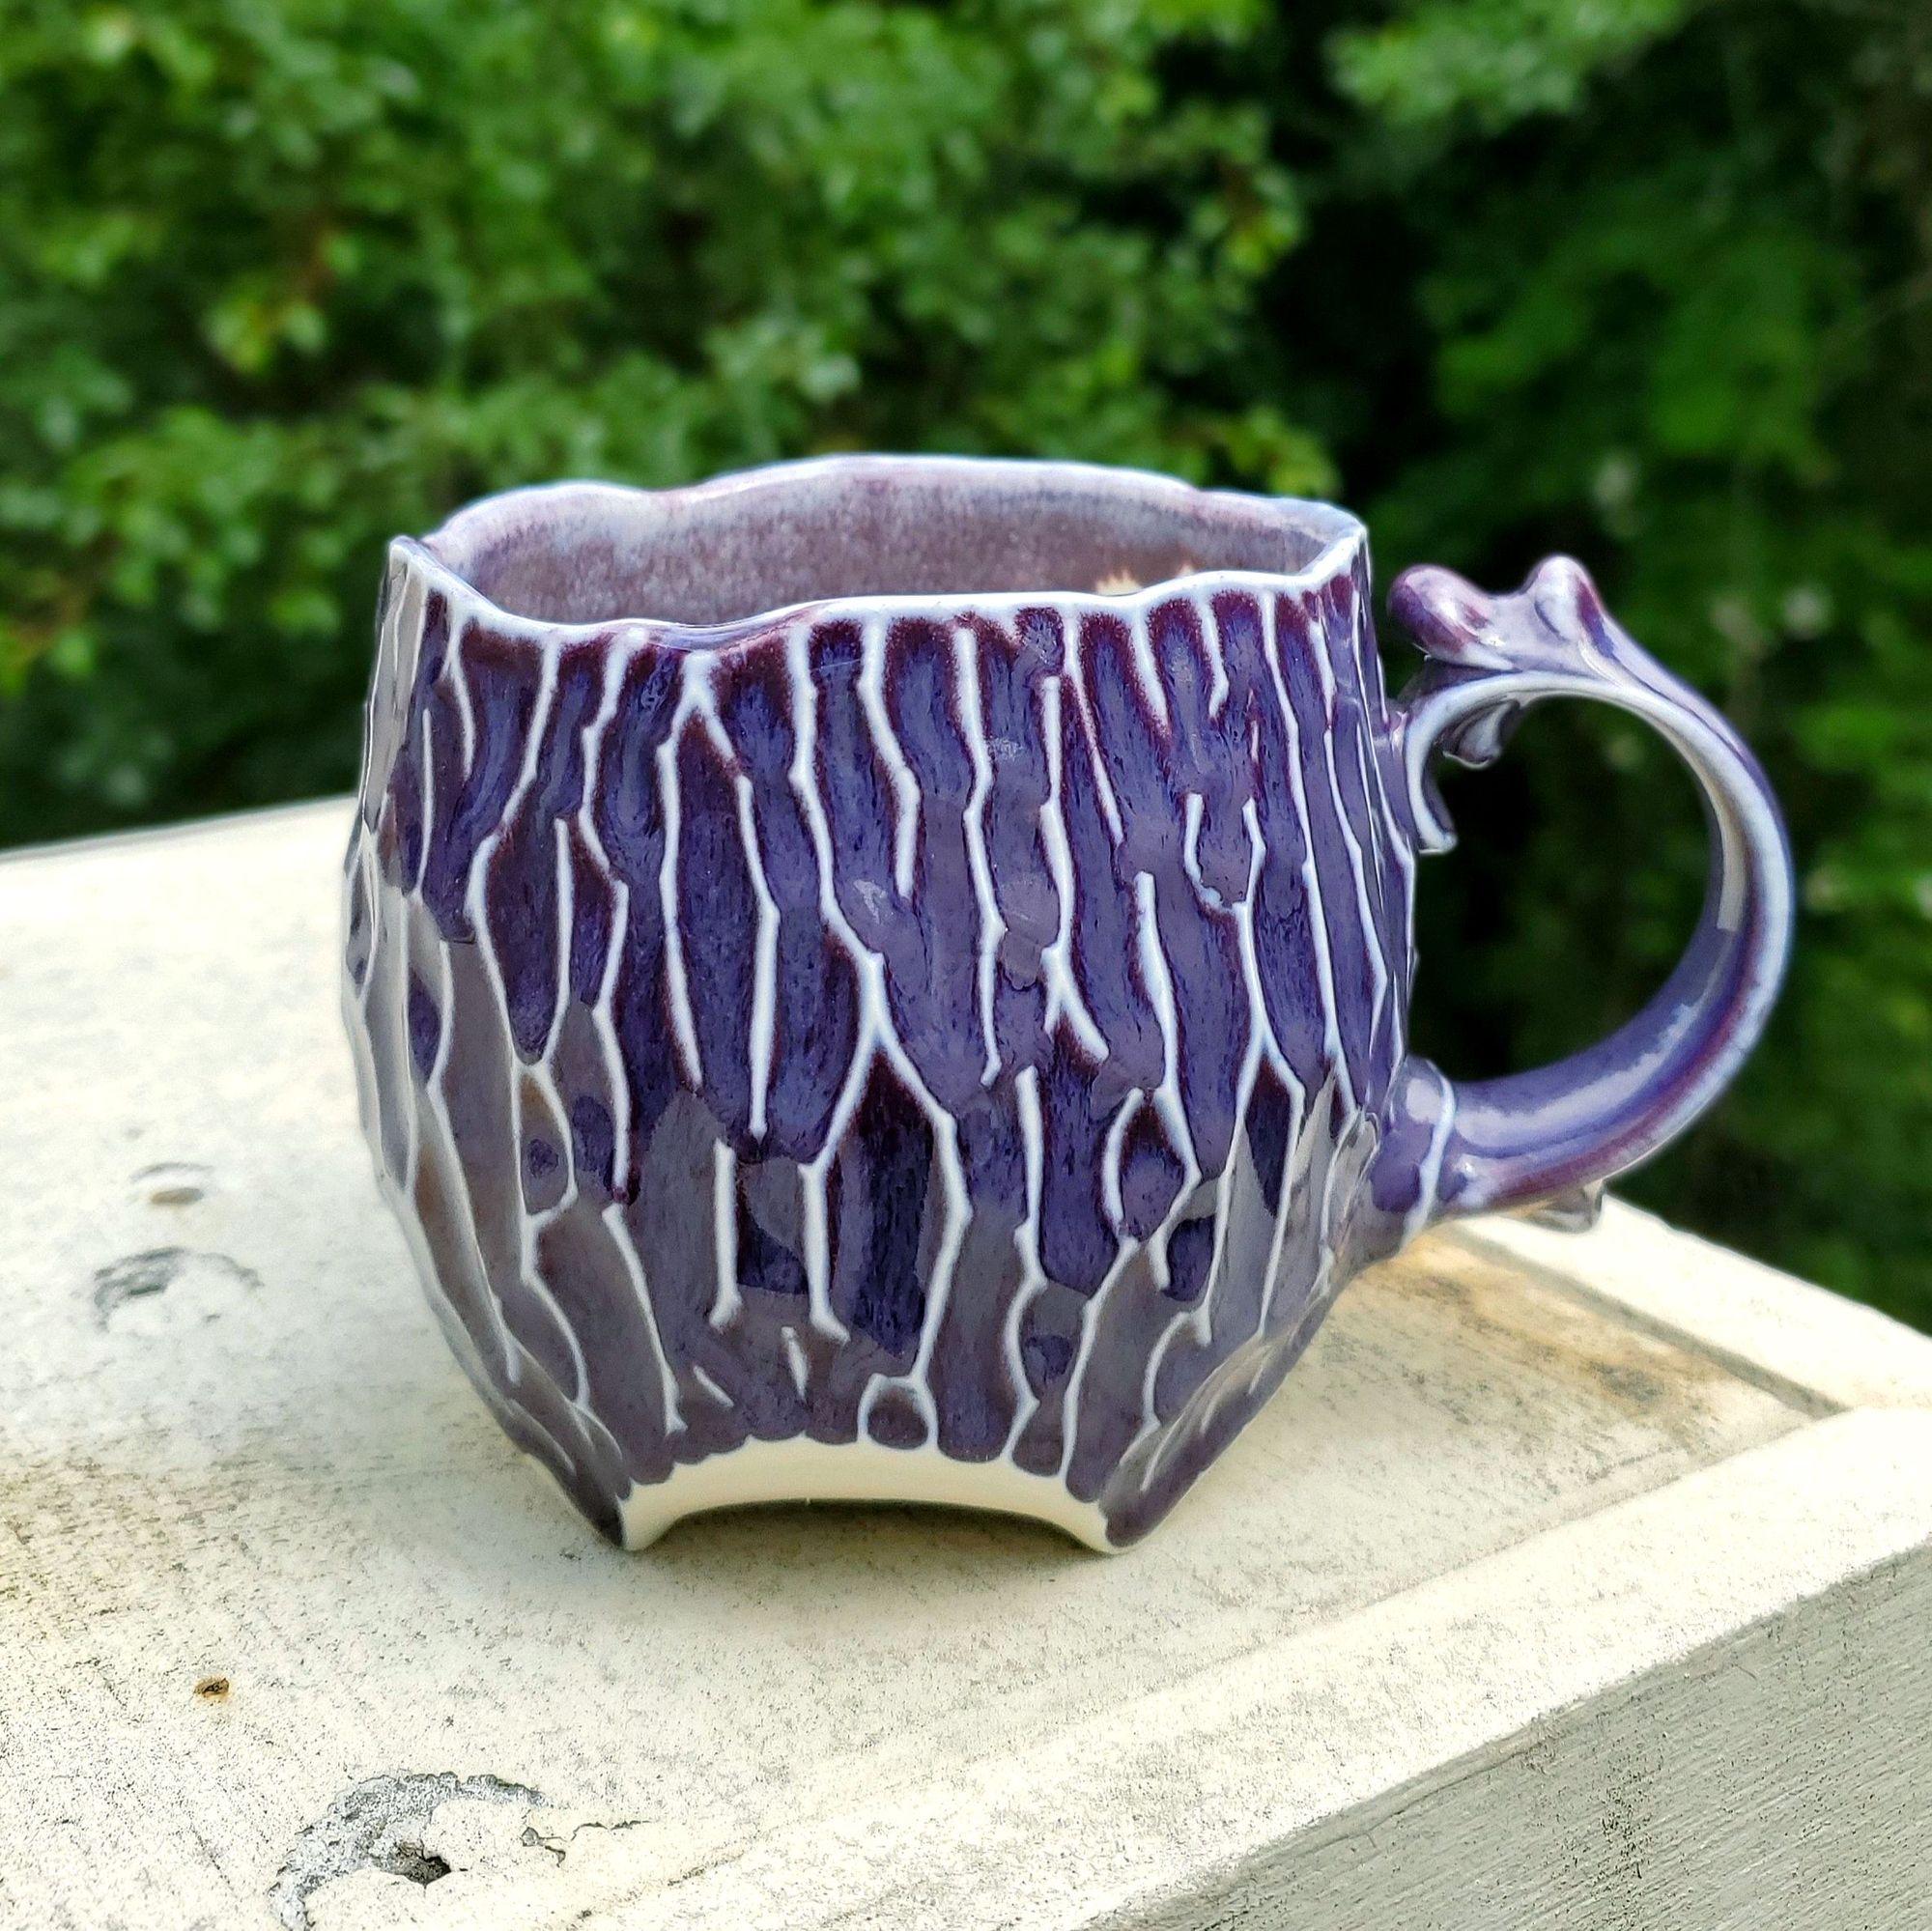 Starting to gather up some finished mugs from my quarantine work-from-home! This mug was approved by my cat, Luna. . . . . .  #kaiceramics #kaitlynchipps #kaitlynceramics #pottery #ceramics #elvish #whimsical #purple #mug #purplemug #kilntotable #fantasy #ceramicart #art #fantasyinspired #femaleartist #potterymagic #elegant #elegance #porcelain #earthy #ethereal #makersgonnamake #pottersofinstagram #potterylife #potterywip #artwip